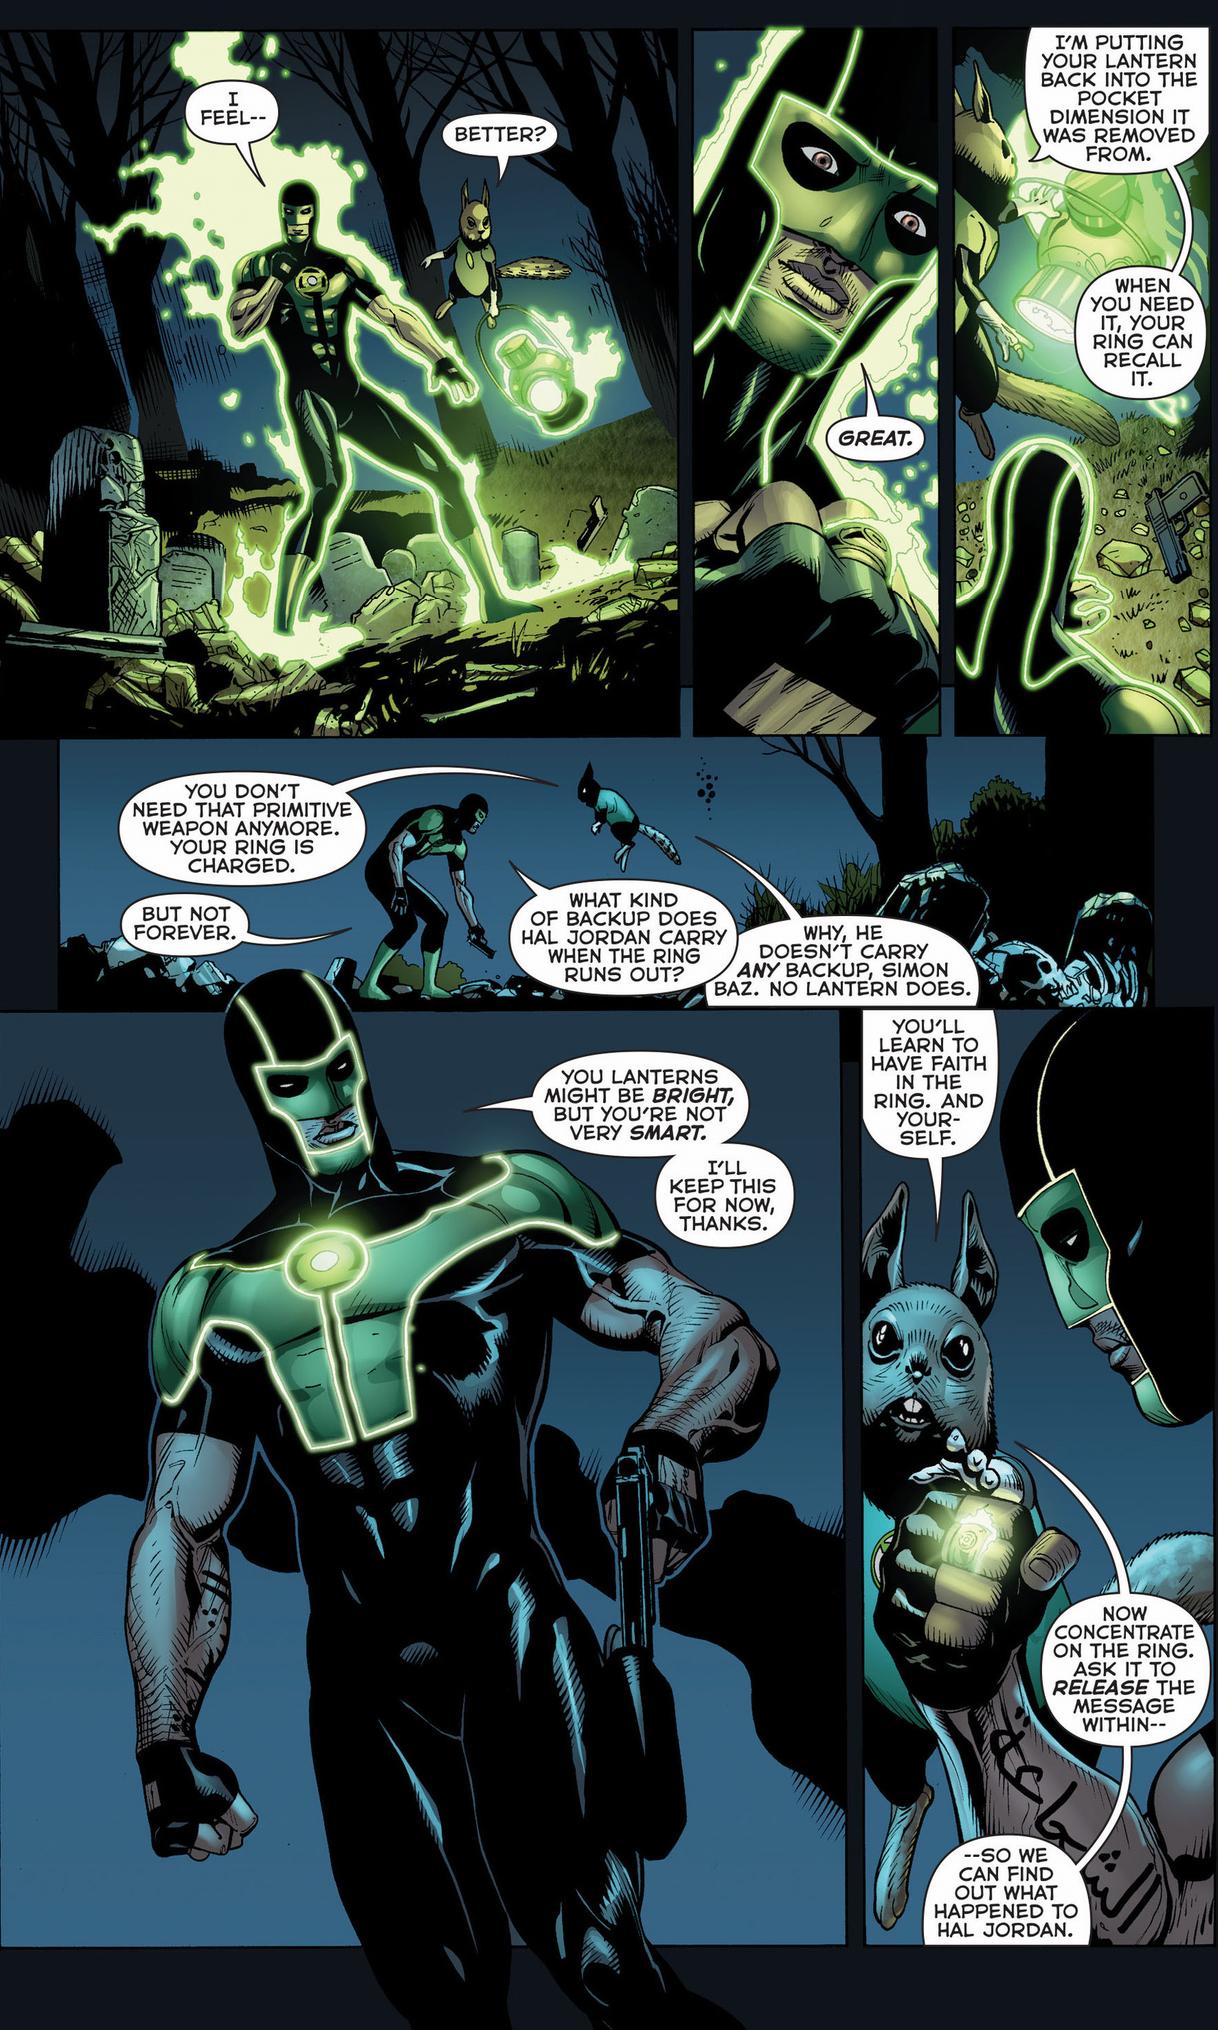 why-green-lantern-simon-baz-carries-a-gun